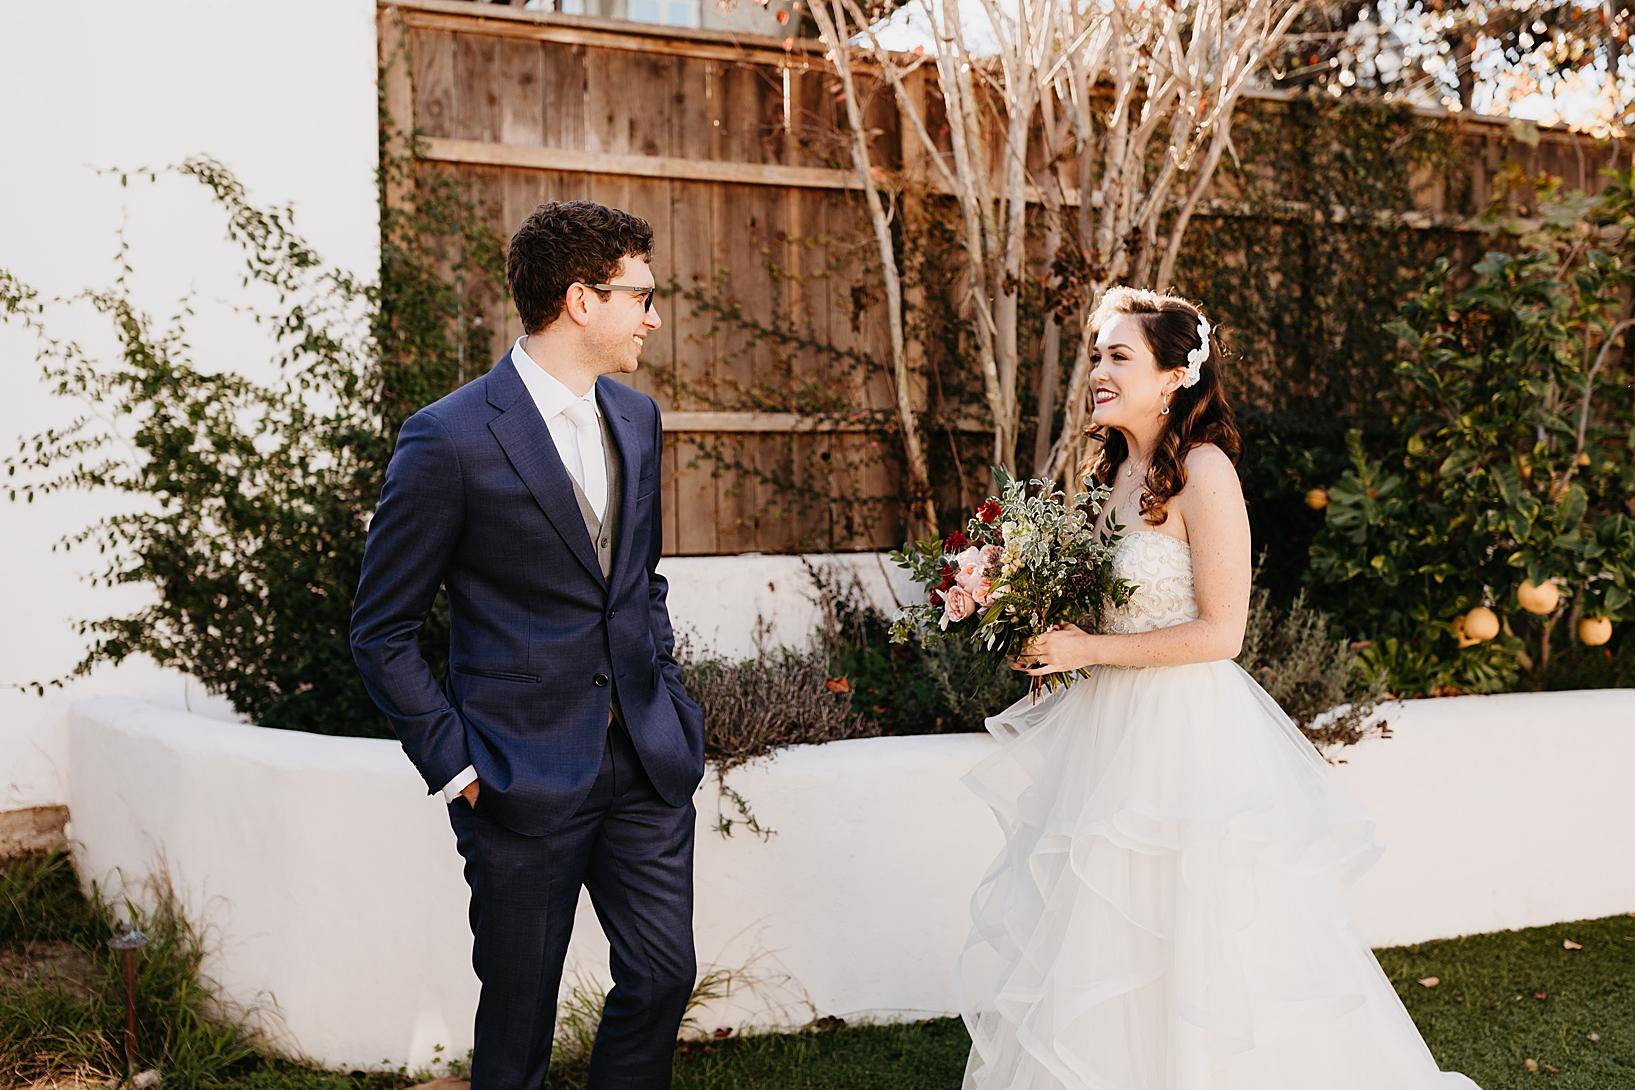 Brick-San-Diego-Winter-Wedding-13.jpg